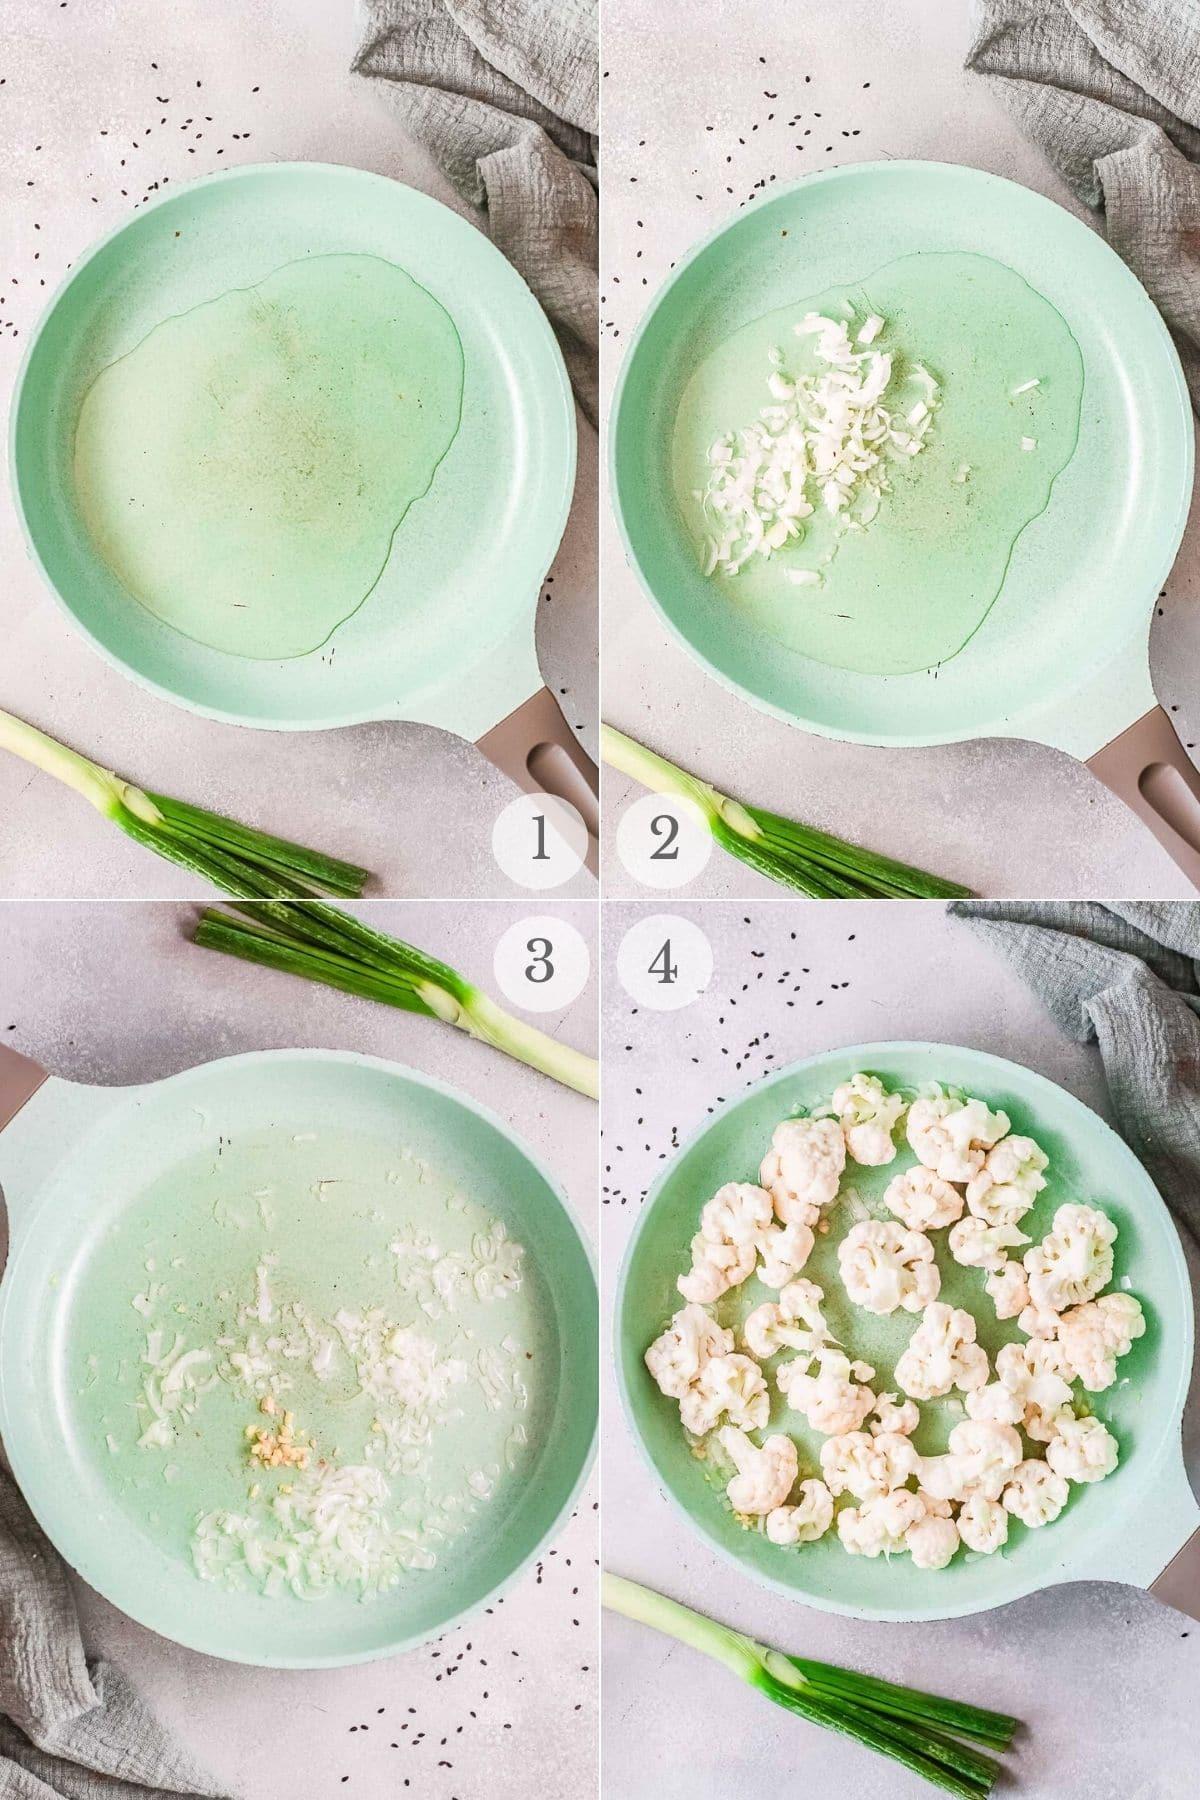 korean bbq cauliflower recipe steps 1-4